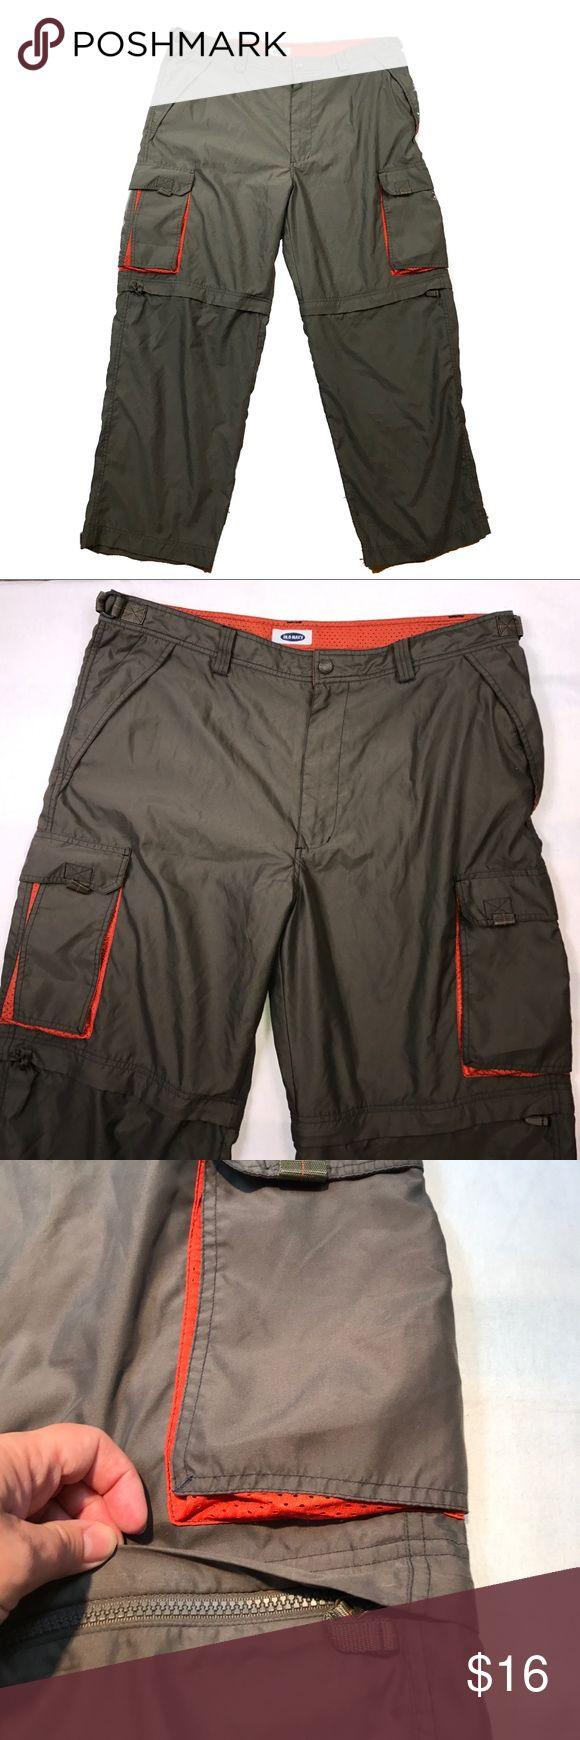 "Men's size W 42 L 30 Old Navy Cargo Pants & Shorts ▪️size 42"" waist, 30"" length when pants ▪️zippered bottoms to make into shorts Old Navy Pants Cargo"